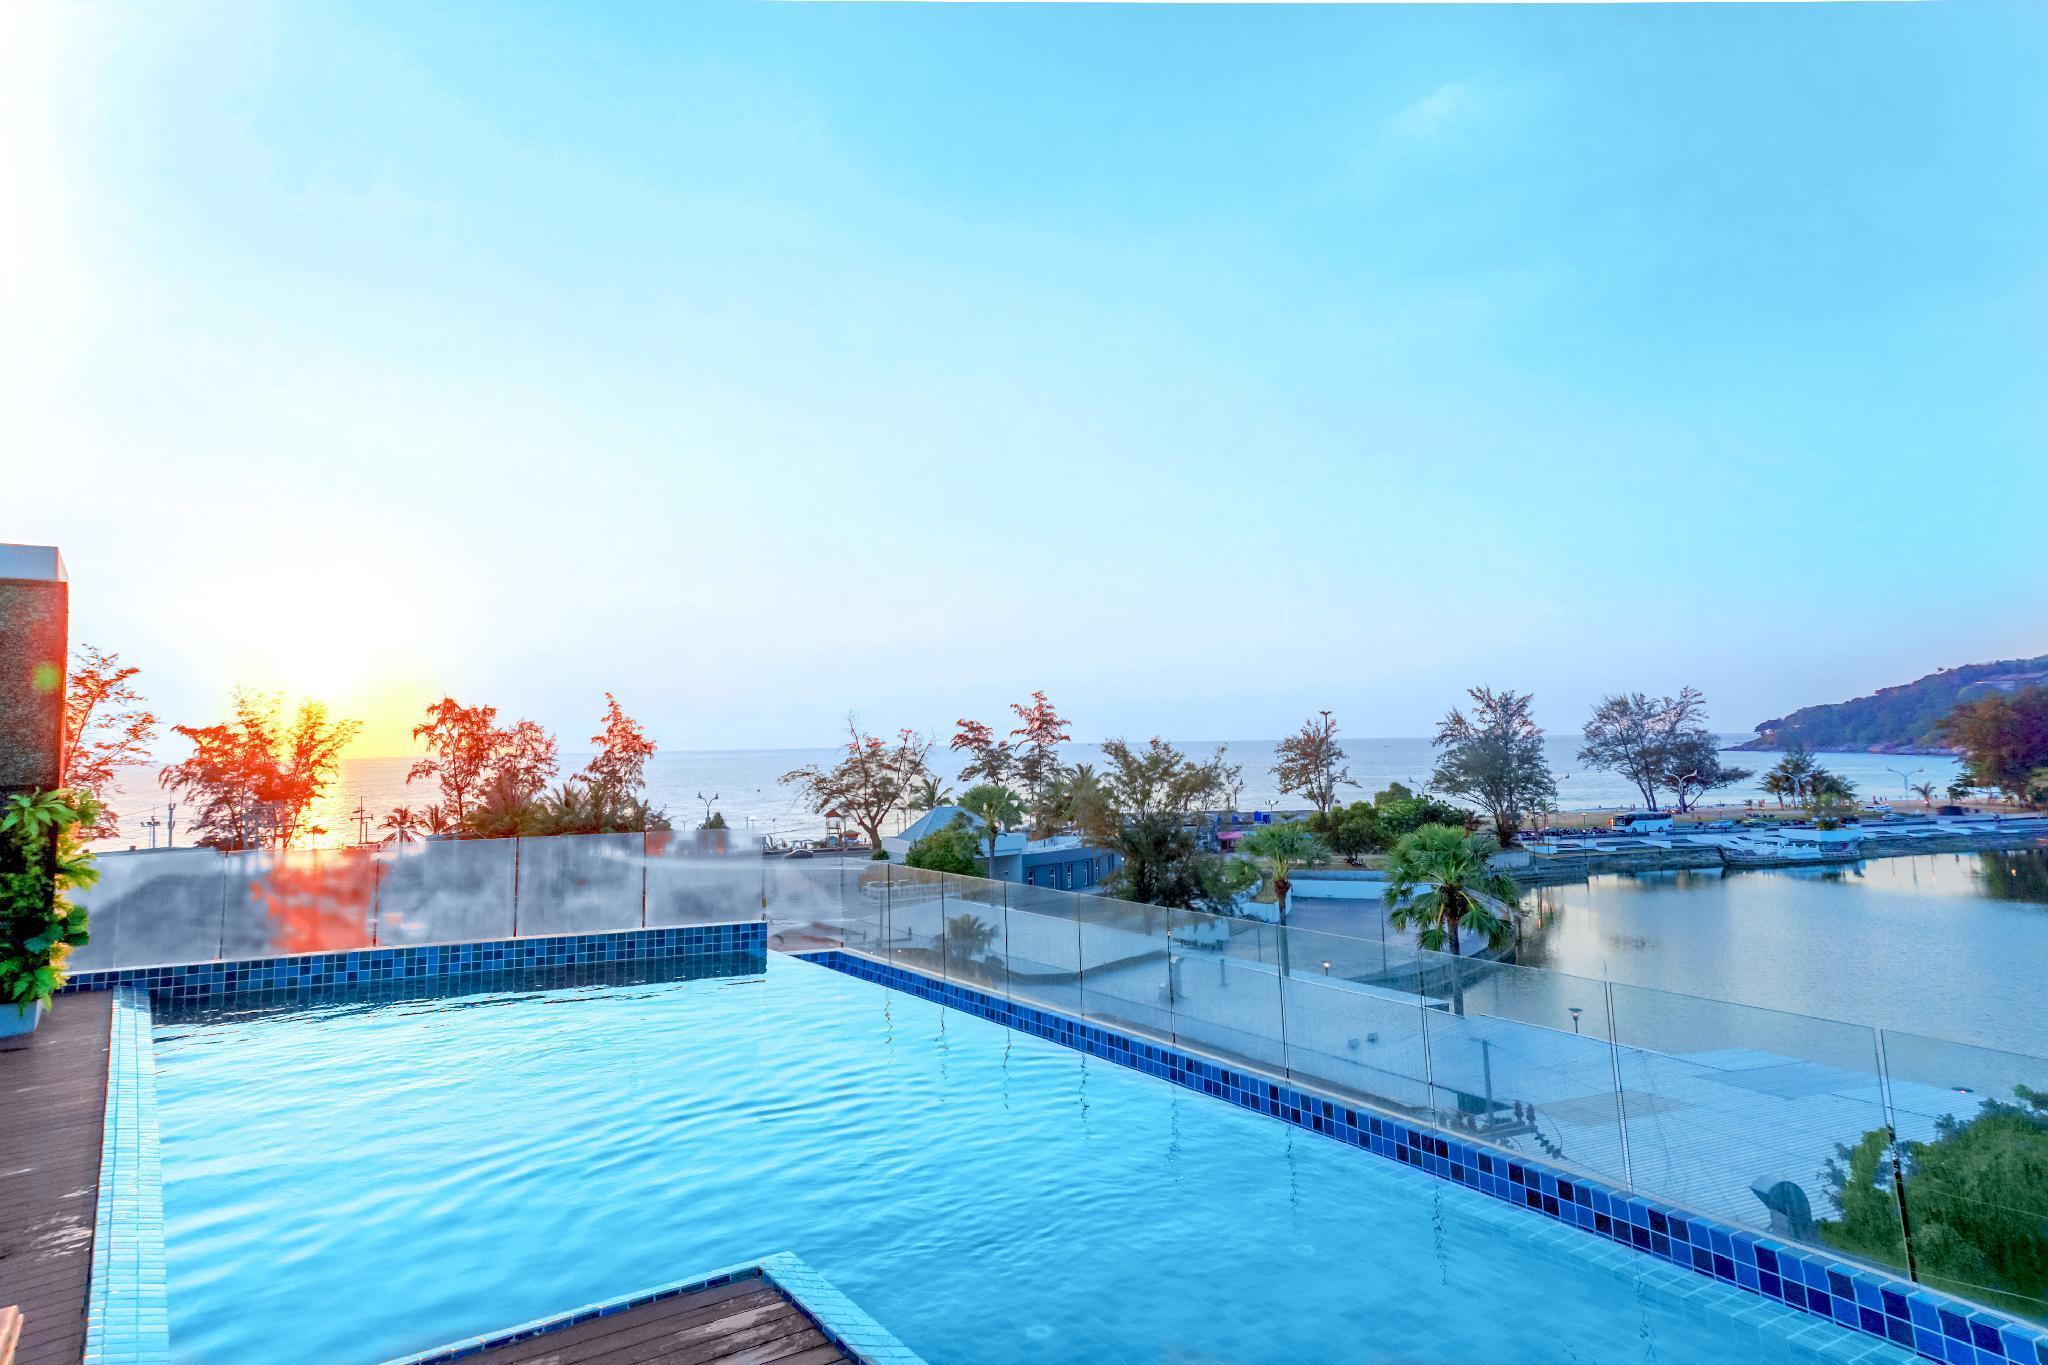 Phoenix Hotel Karon Beach โรงแรมฟีนิกซ์ หาดกะรน